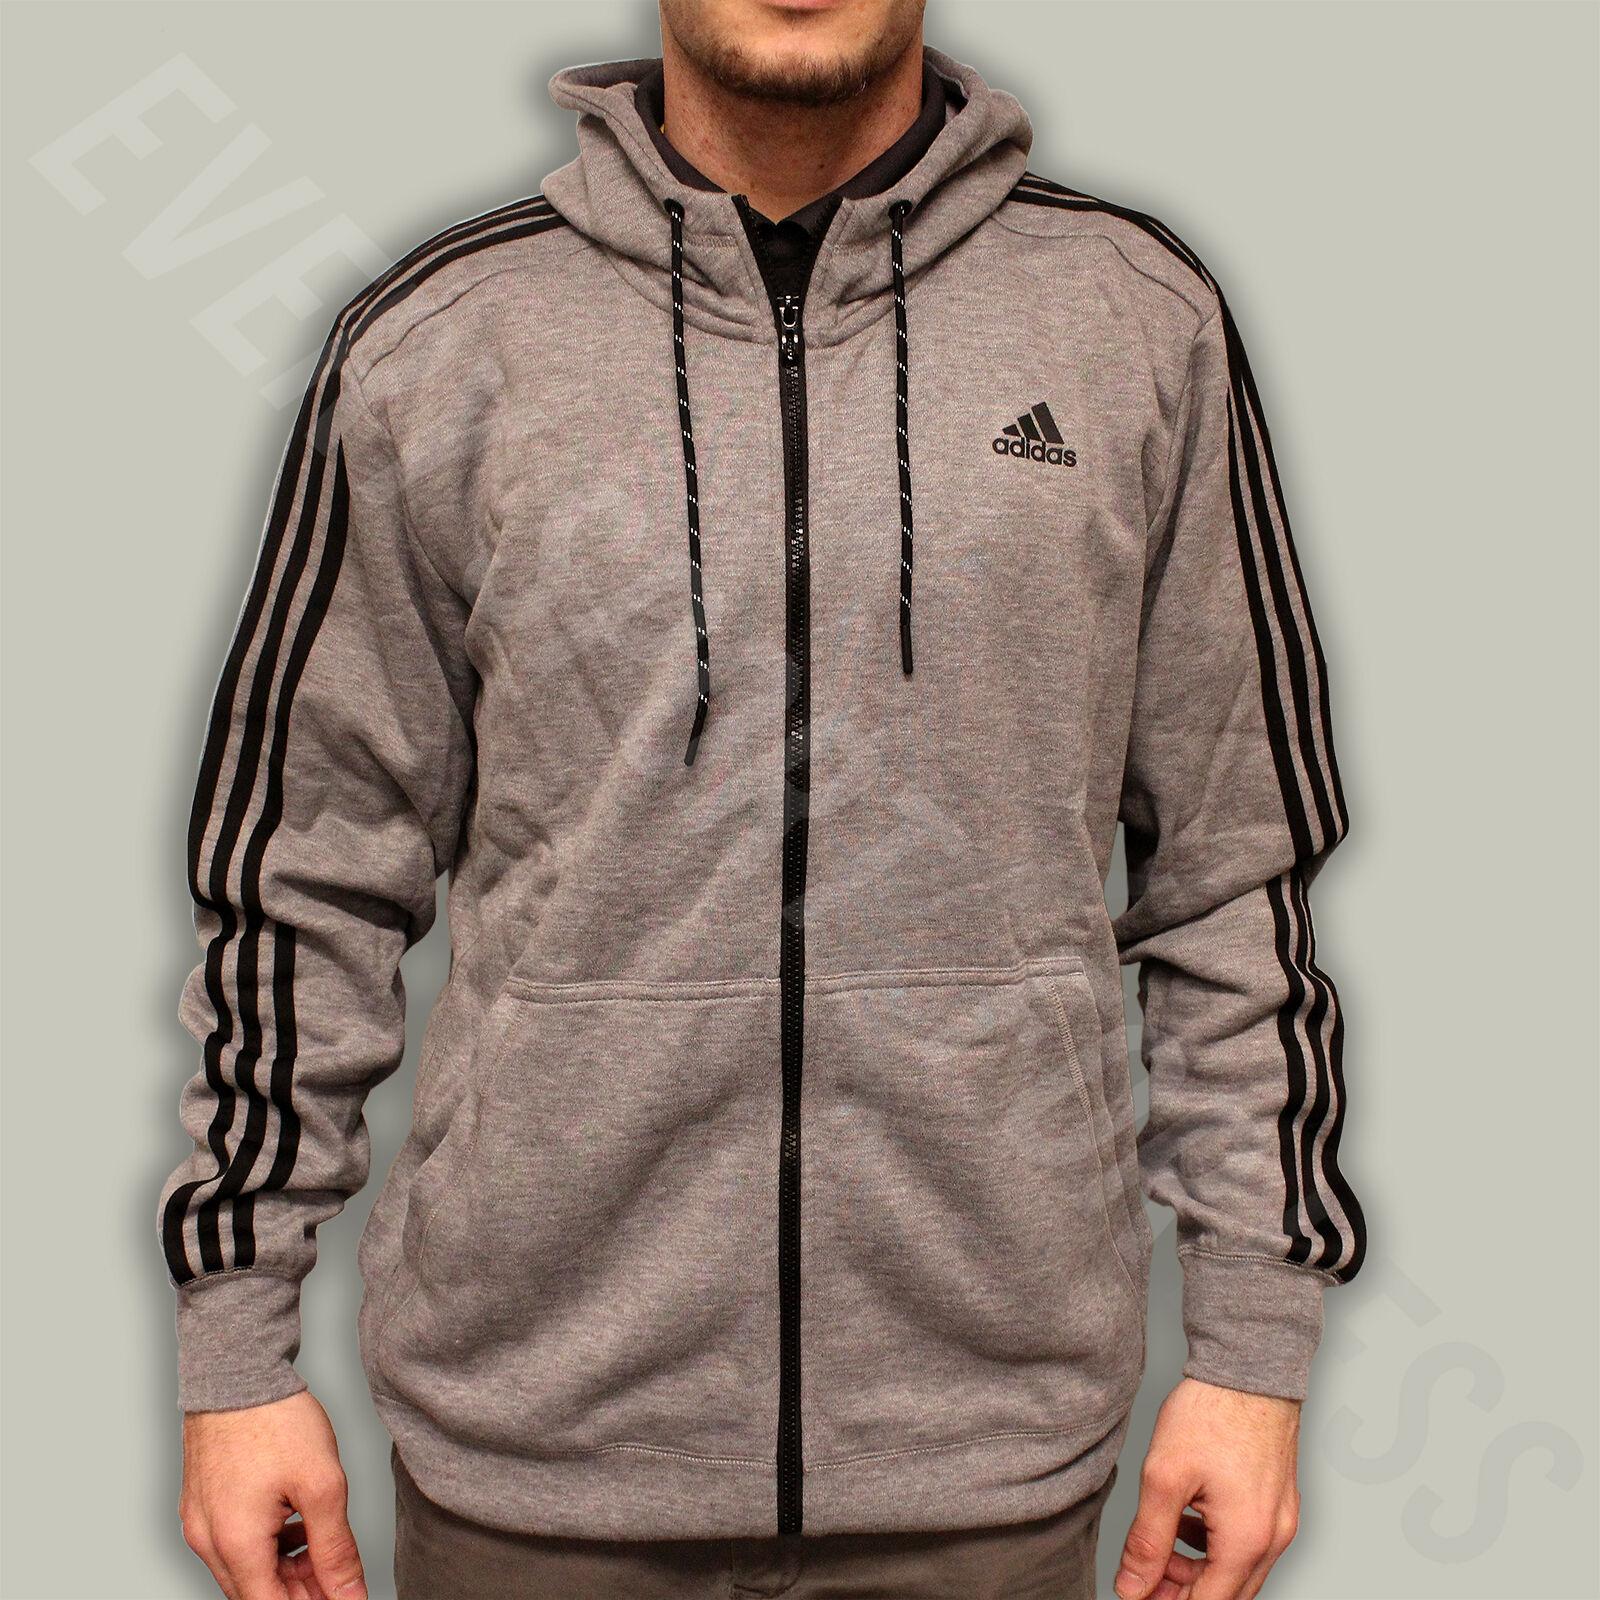 34612c5d Adidas Essentials 3 Stripe FZ Hoodie S17875 Adult Core Heather (NEW) Lists  @ $65